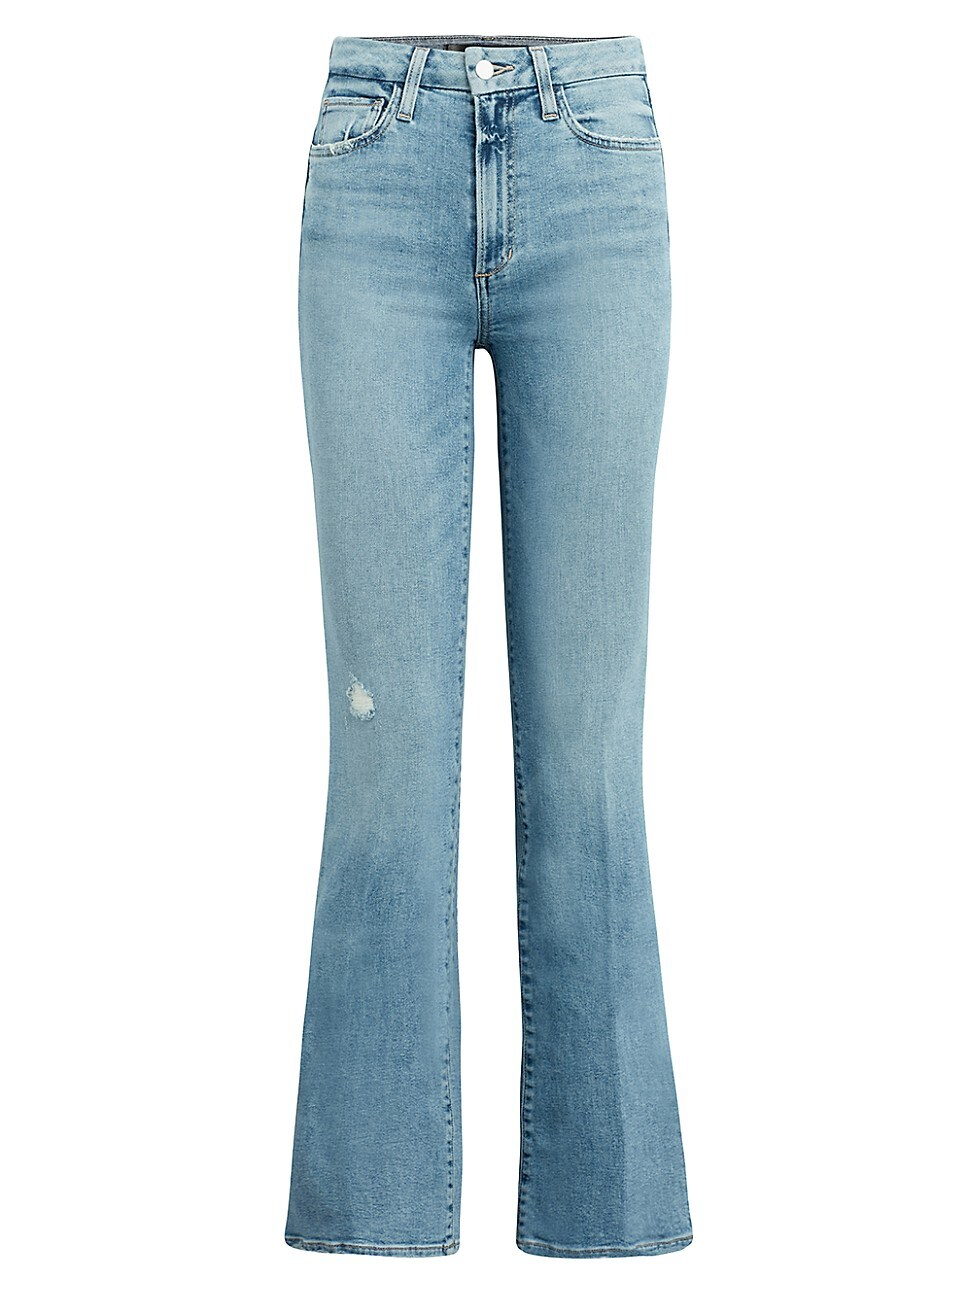 Joe's Jeans WOMEN'S THE HI HONEY BOOTCUT JEANS